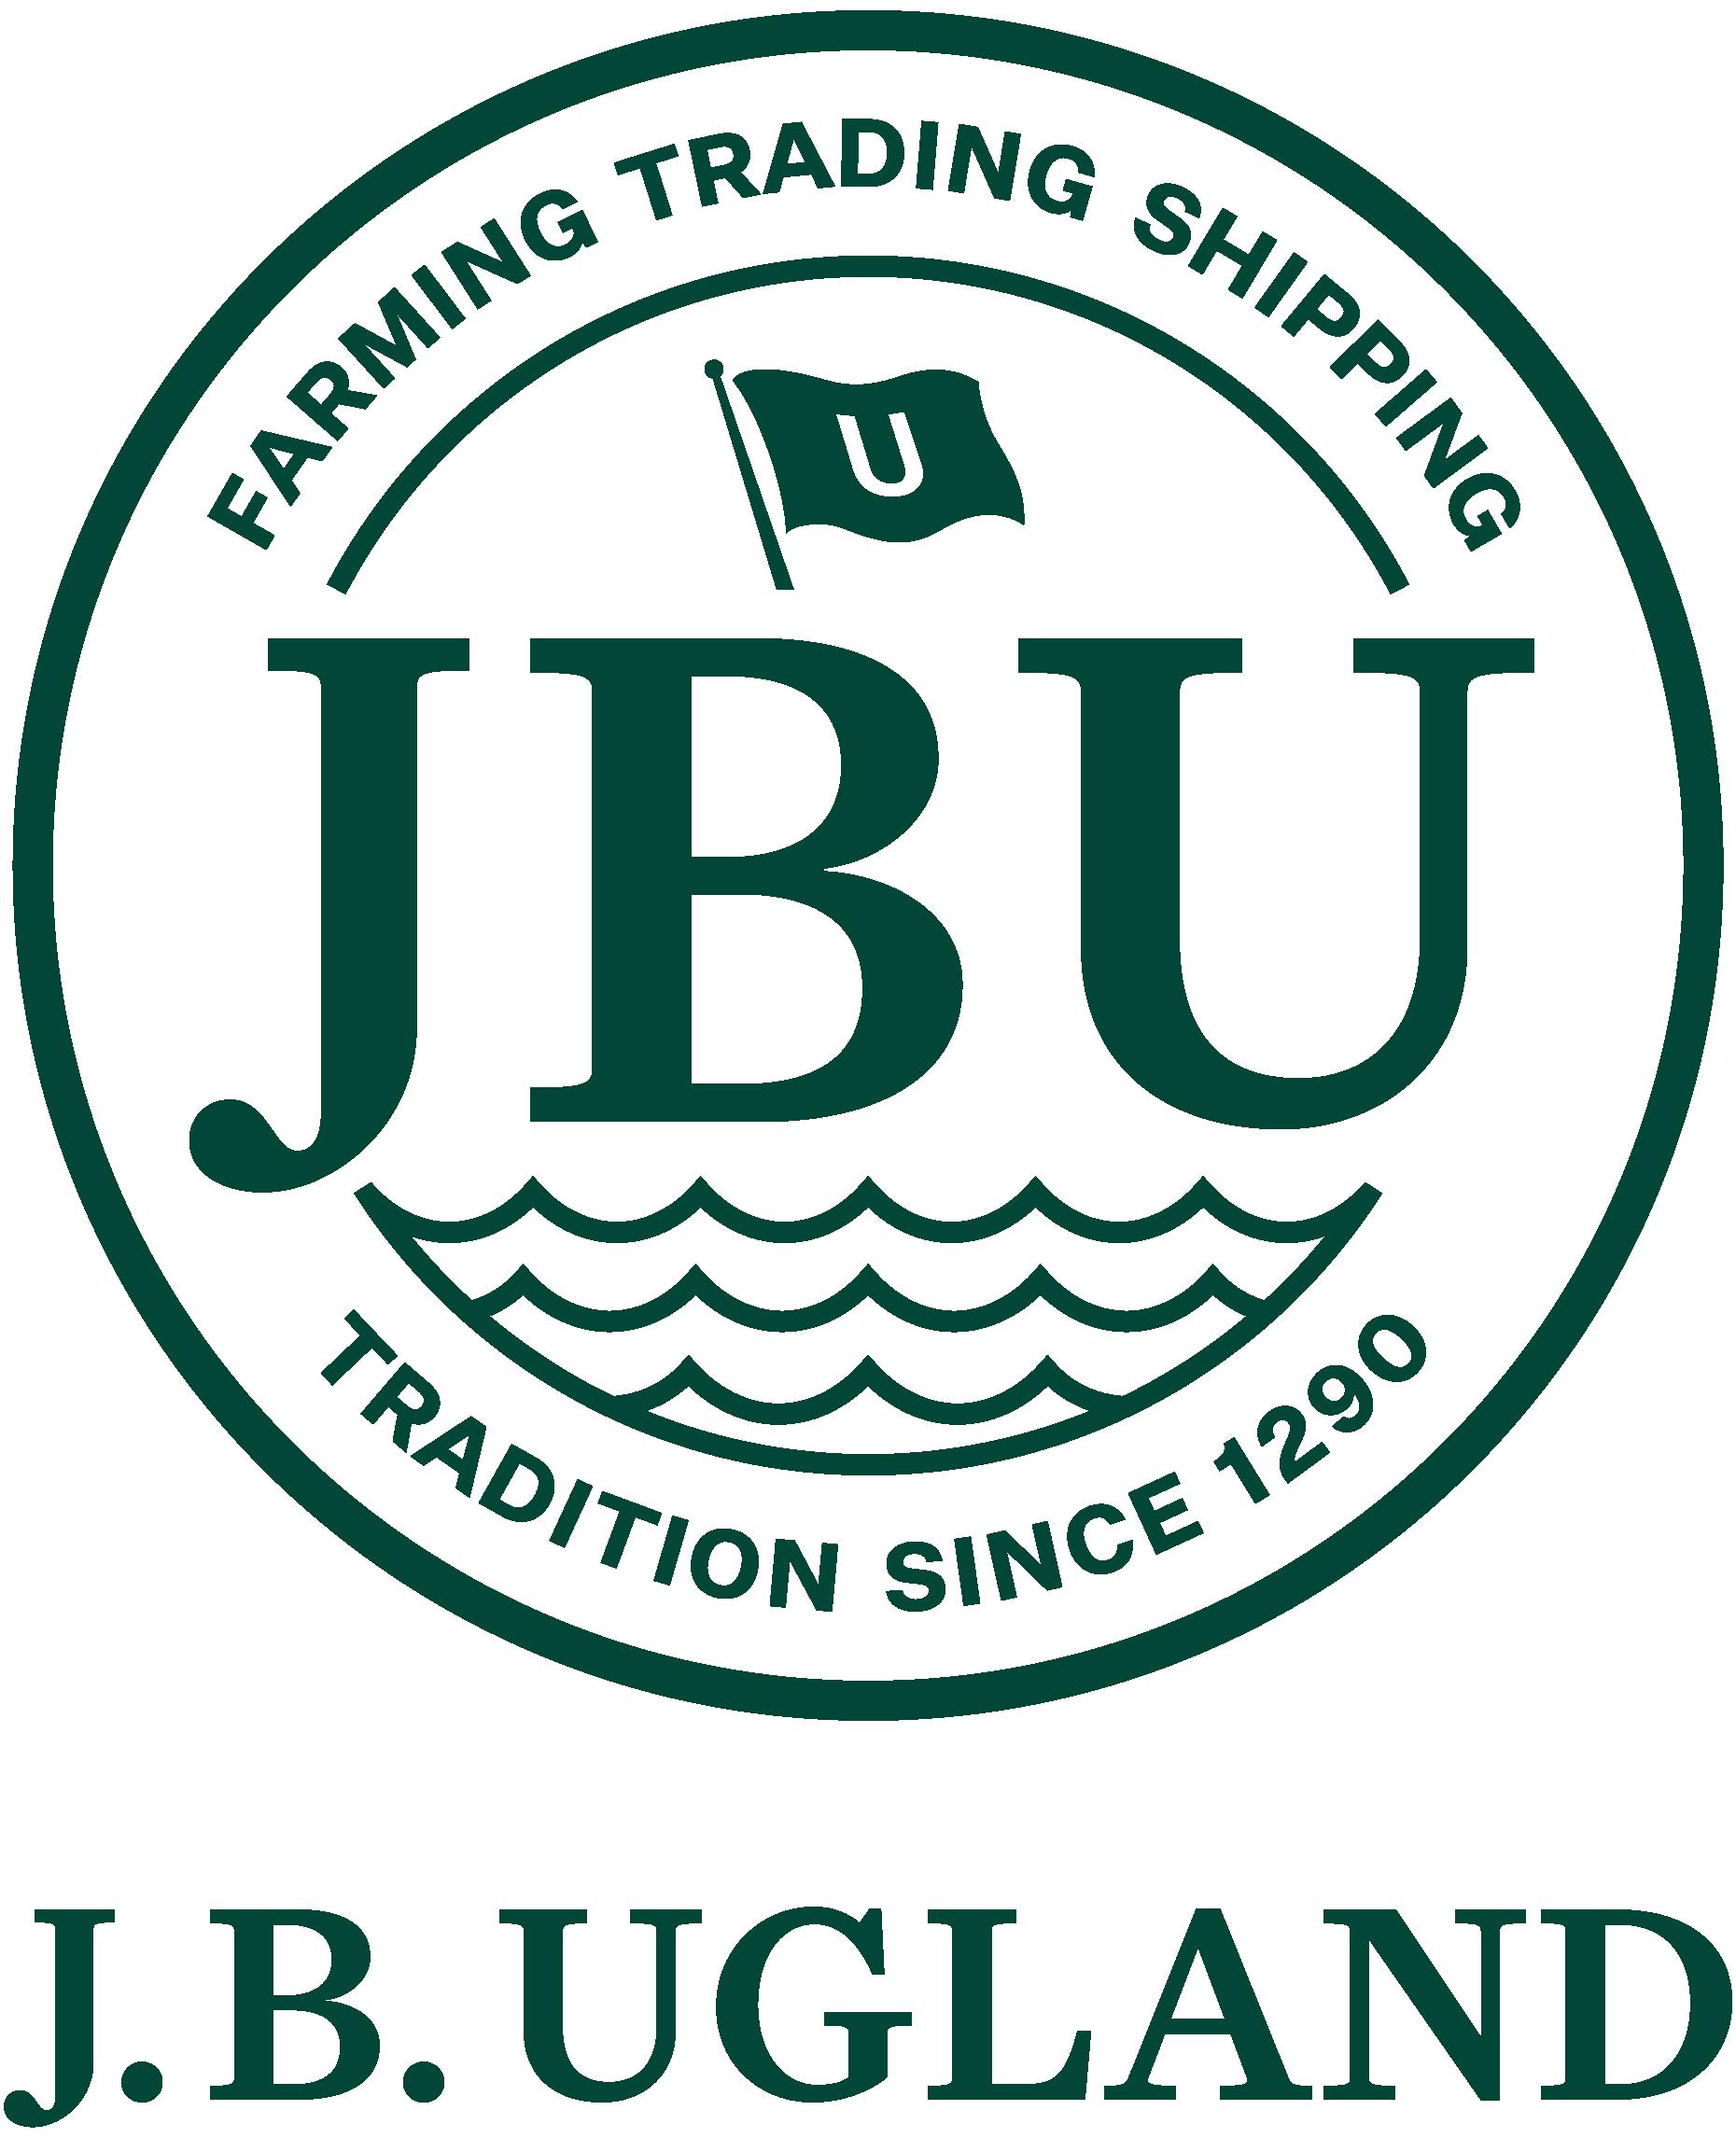 J.B. Ugland logo